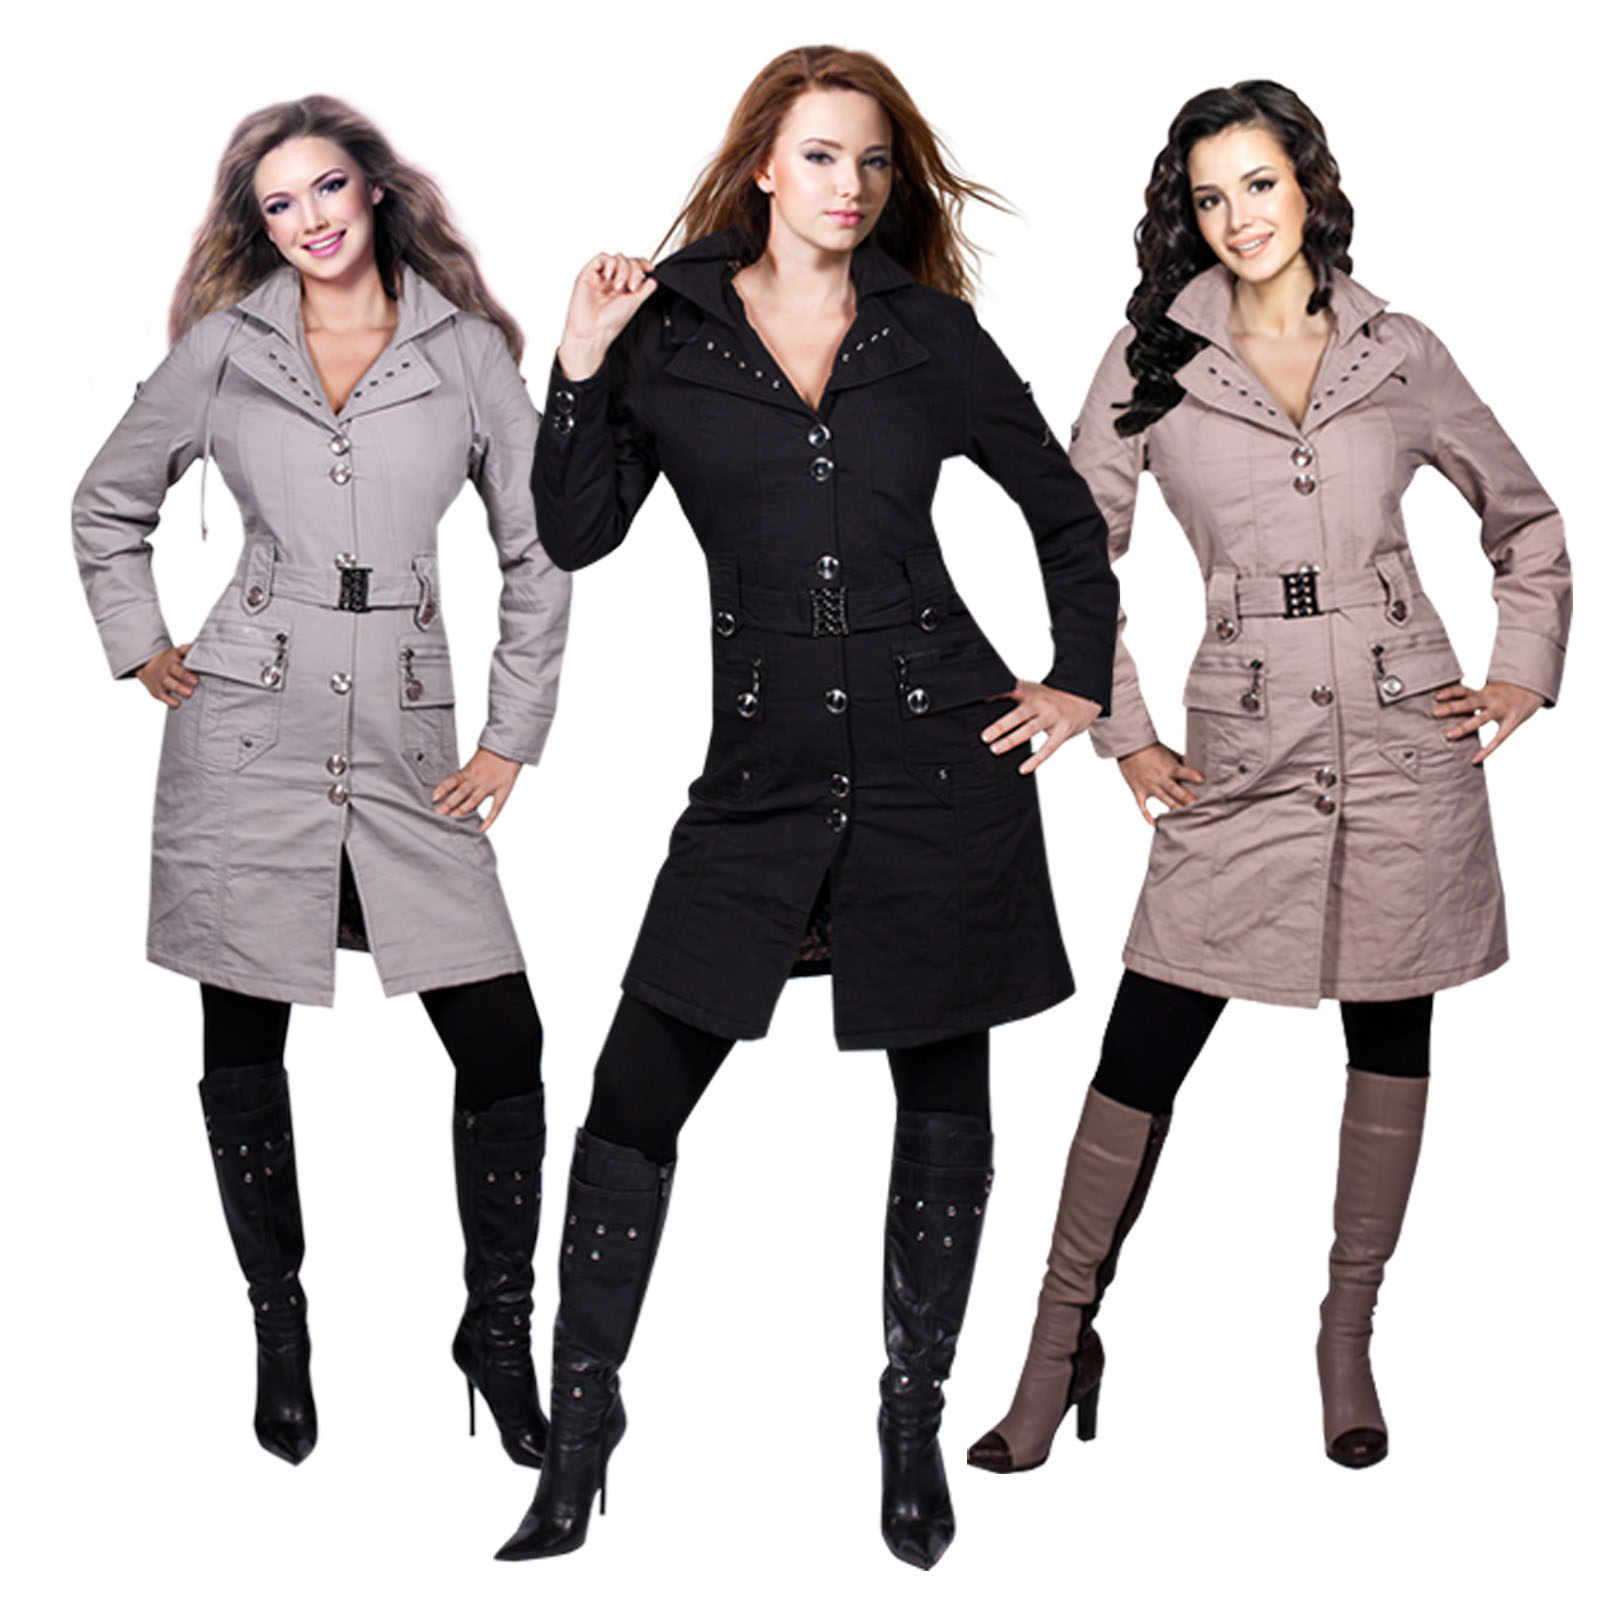 luxus damen wintermantel warm jacke lang cotton mantel parka kapuze s m l xl neu ebay. Black Bedroom Furniture Sets. Home Design Ideas